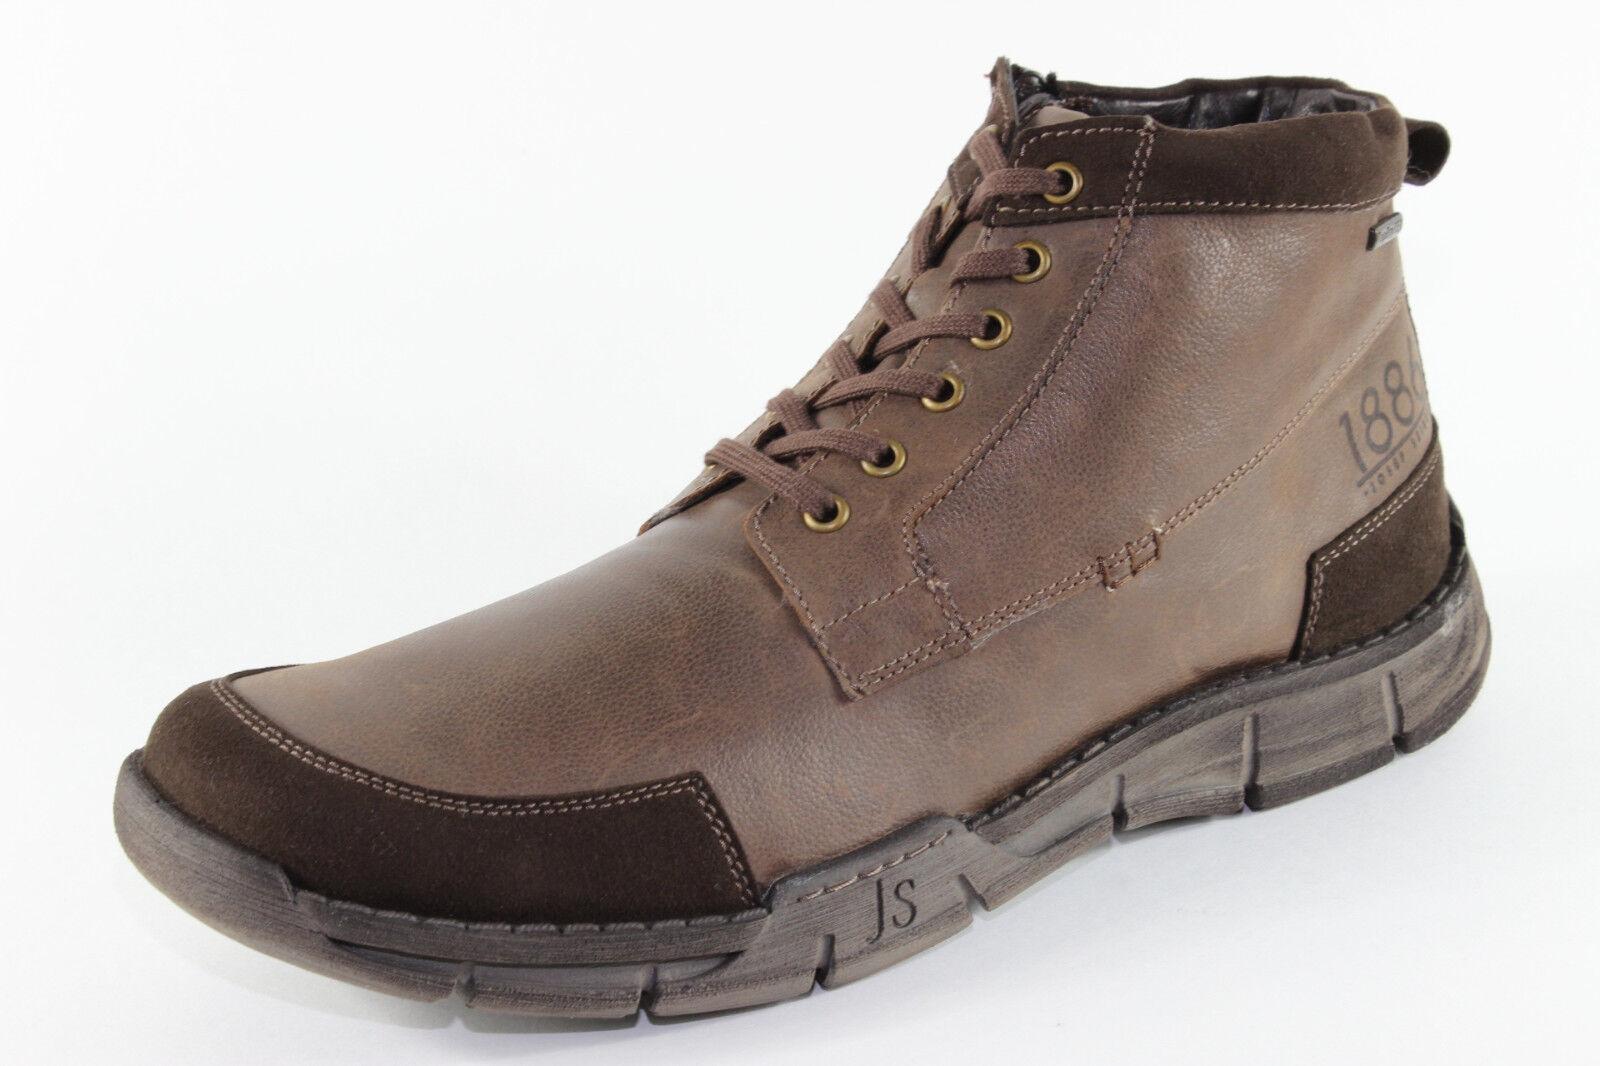 Josef Seibel Phil 03, warme warme warme Stiefel aus Leder, Herrenschuhe Übergröße ef9bbf